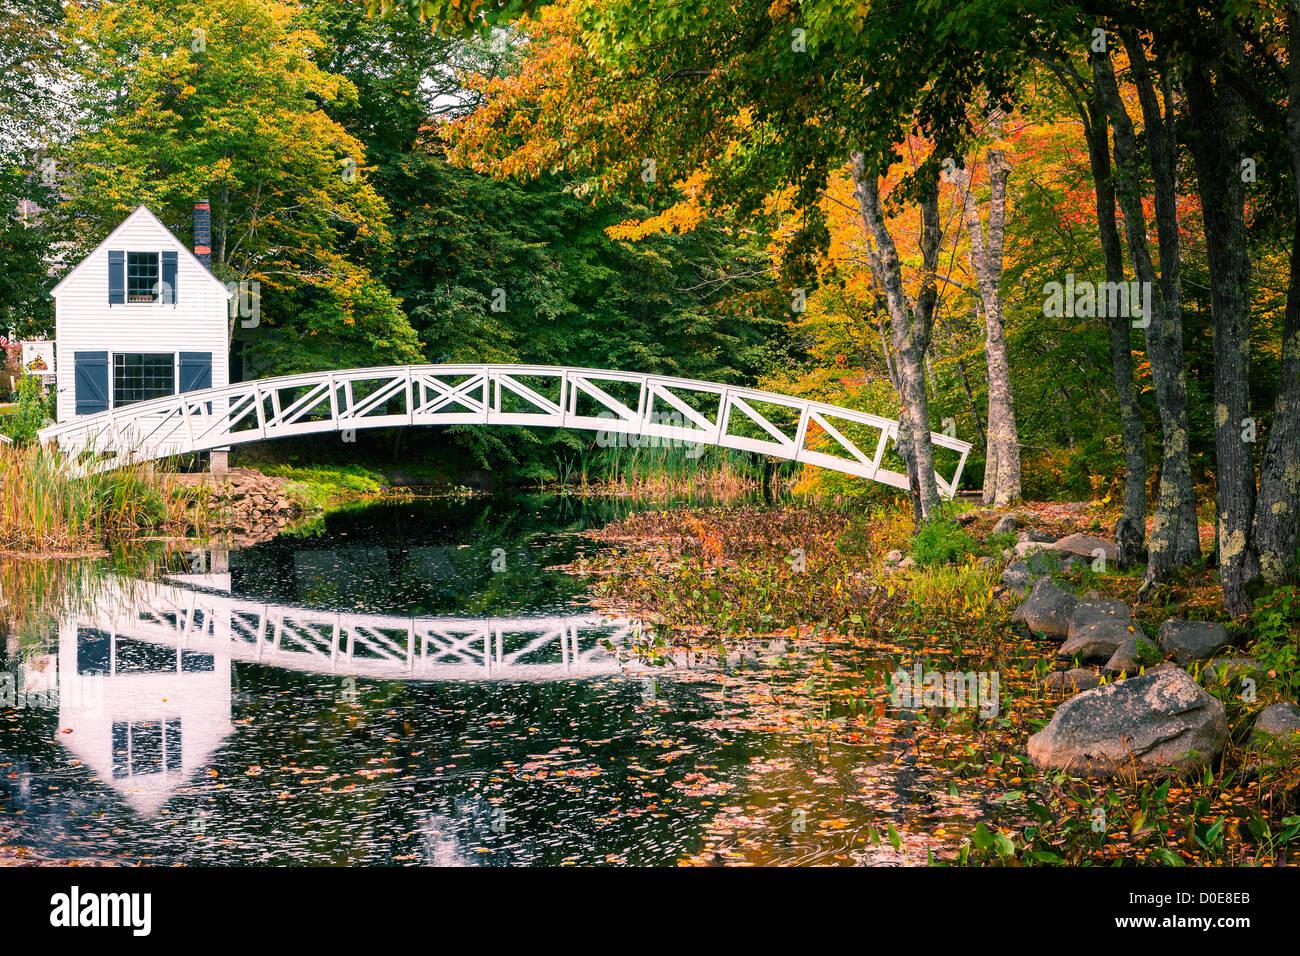 Somesville bridge en Acadie N.P, Maine, USA Photo Stock